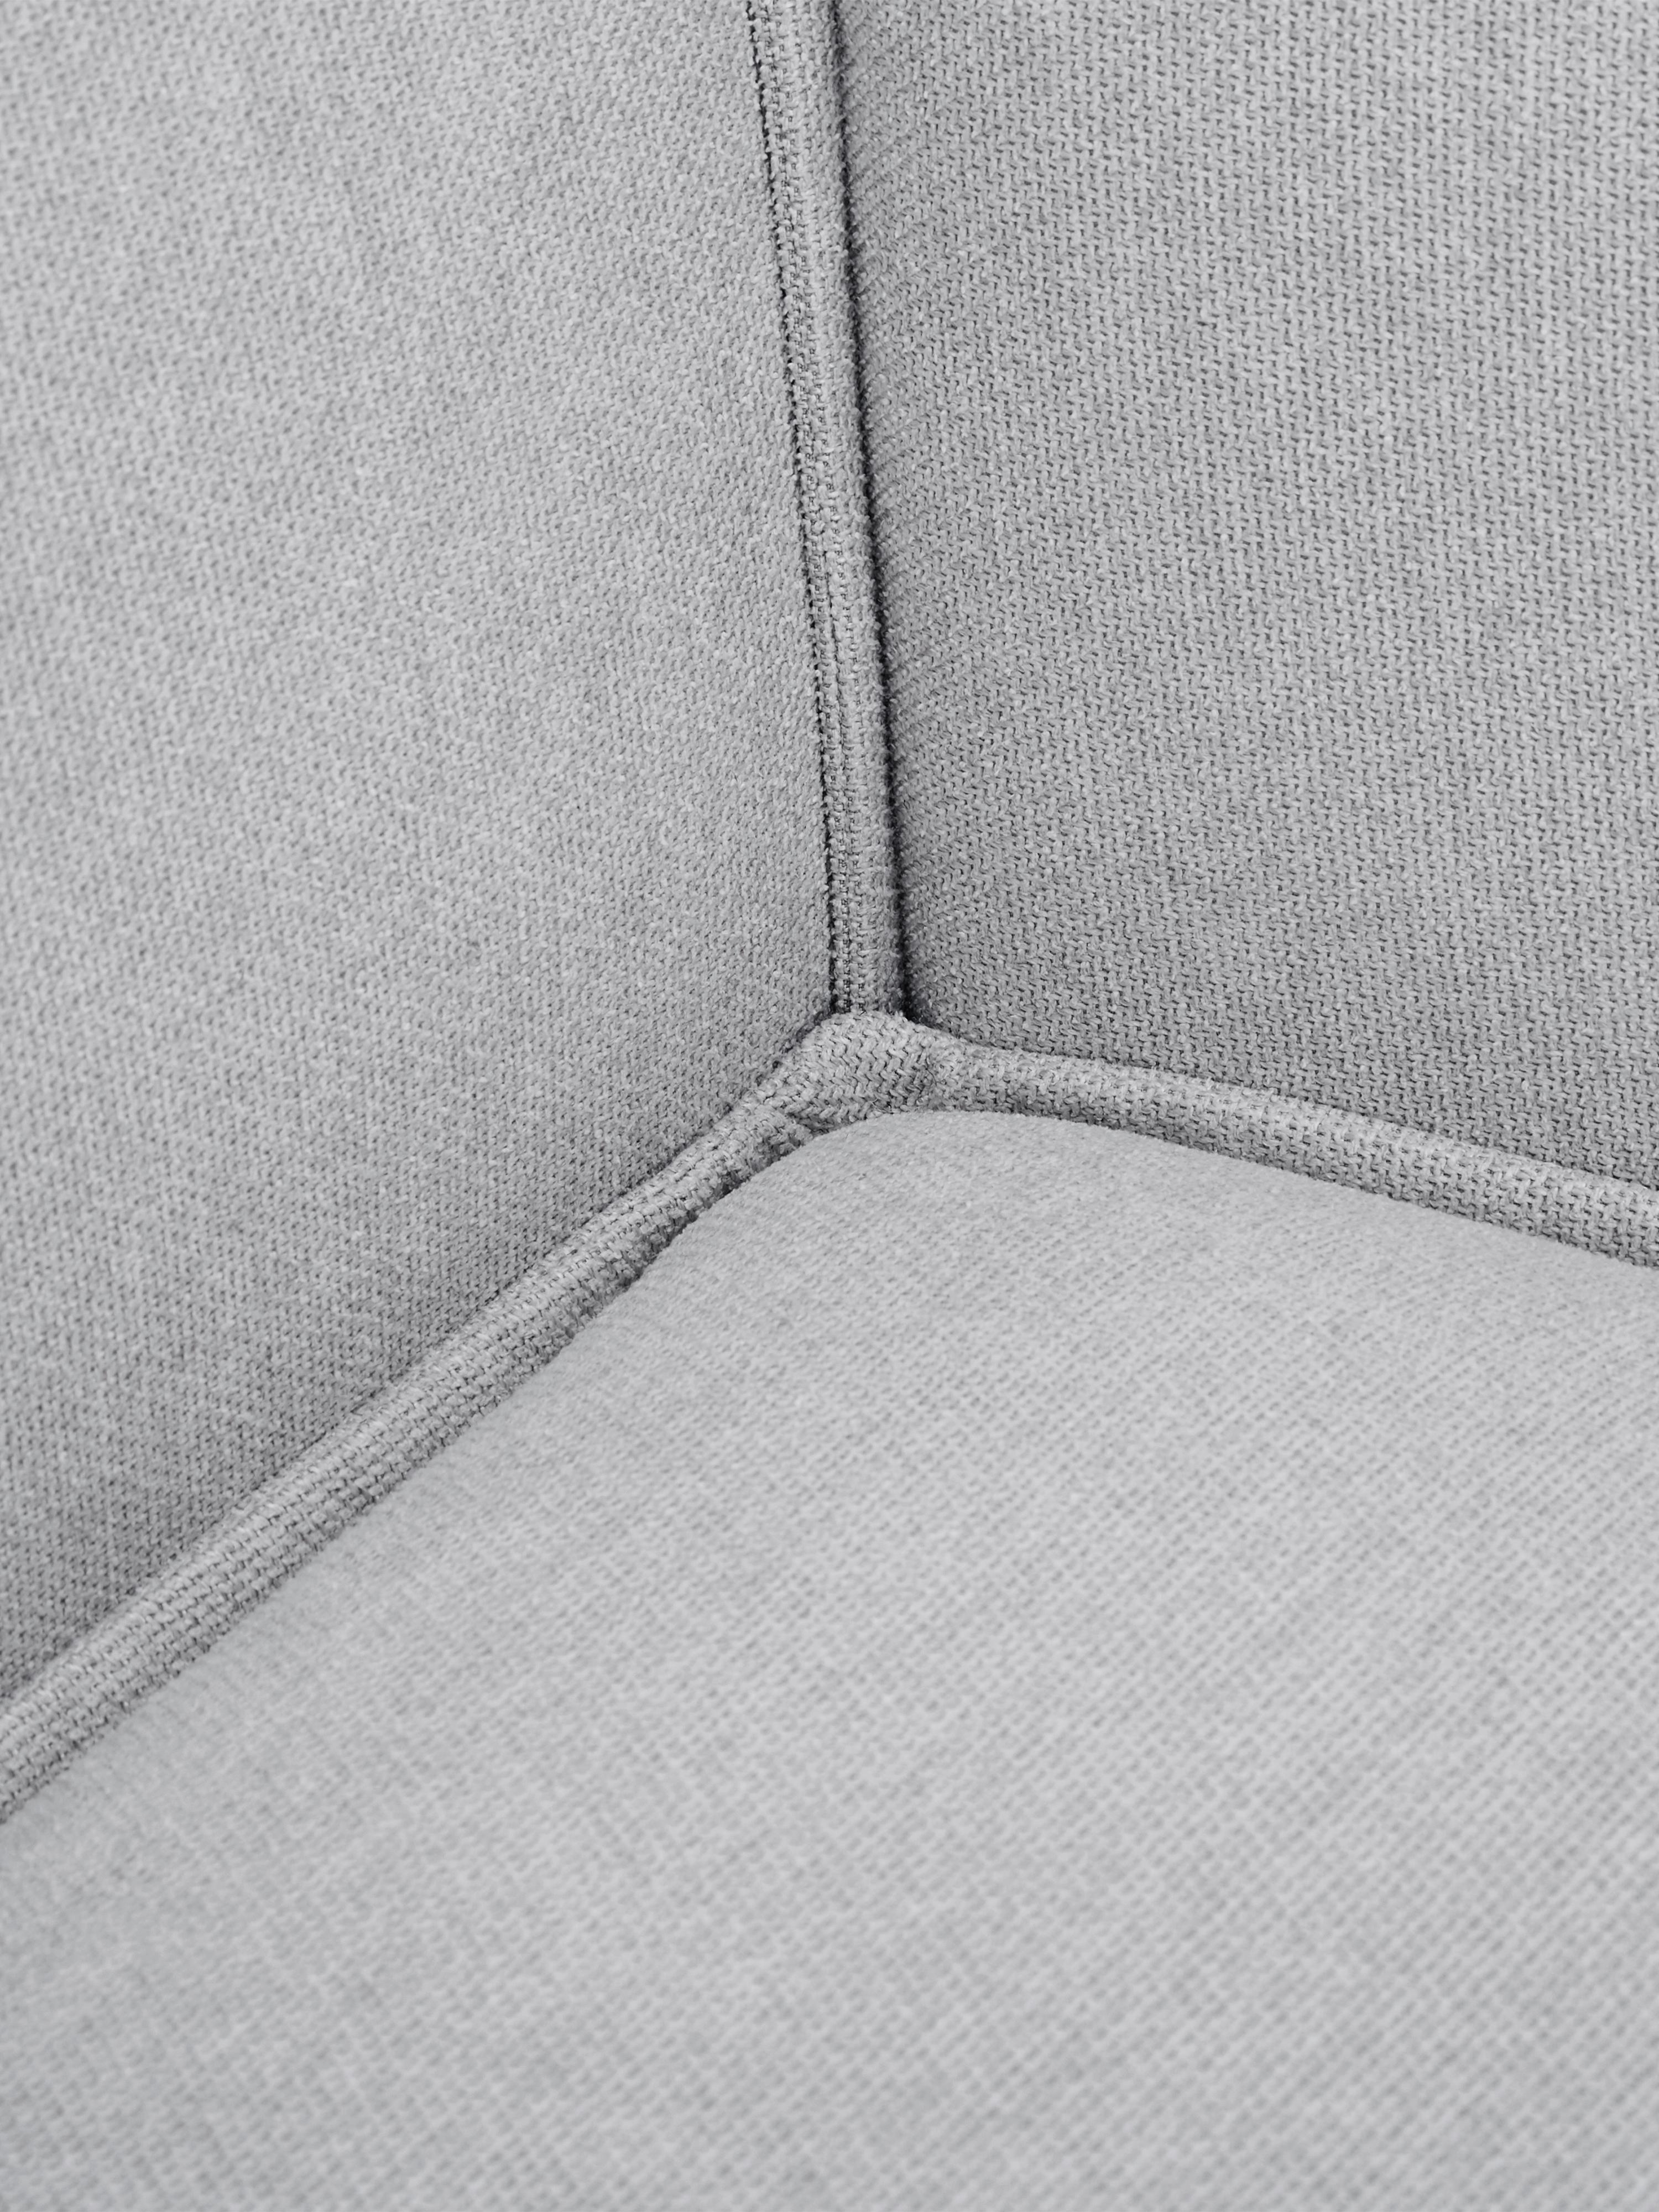 Modulares Ecksofa Lennon, Bezug: Polyester Der hochwertige, Gestell: Massives Kiefernholz, Spe, Füße: Kunststoff, Webstoff Hellgrau, B 326 x T 207 cm